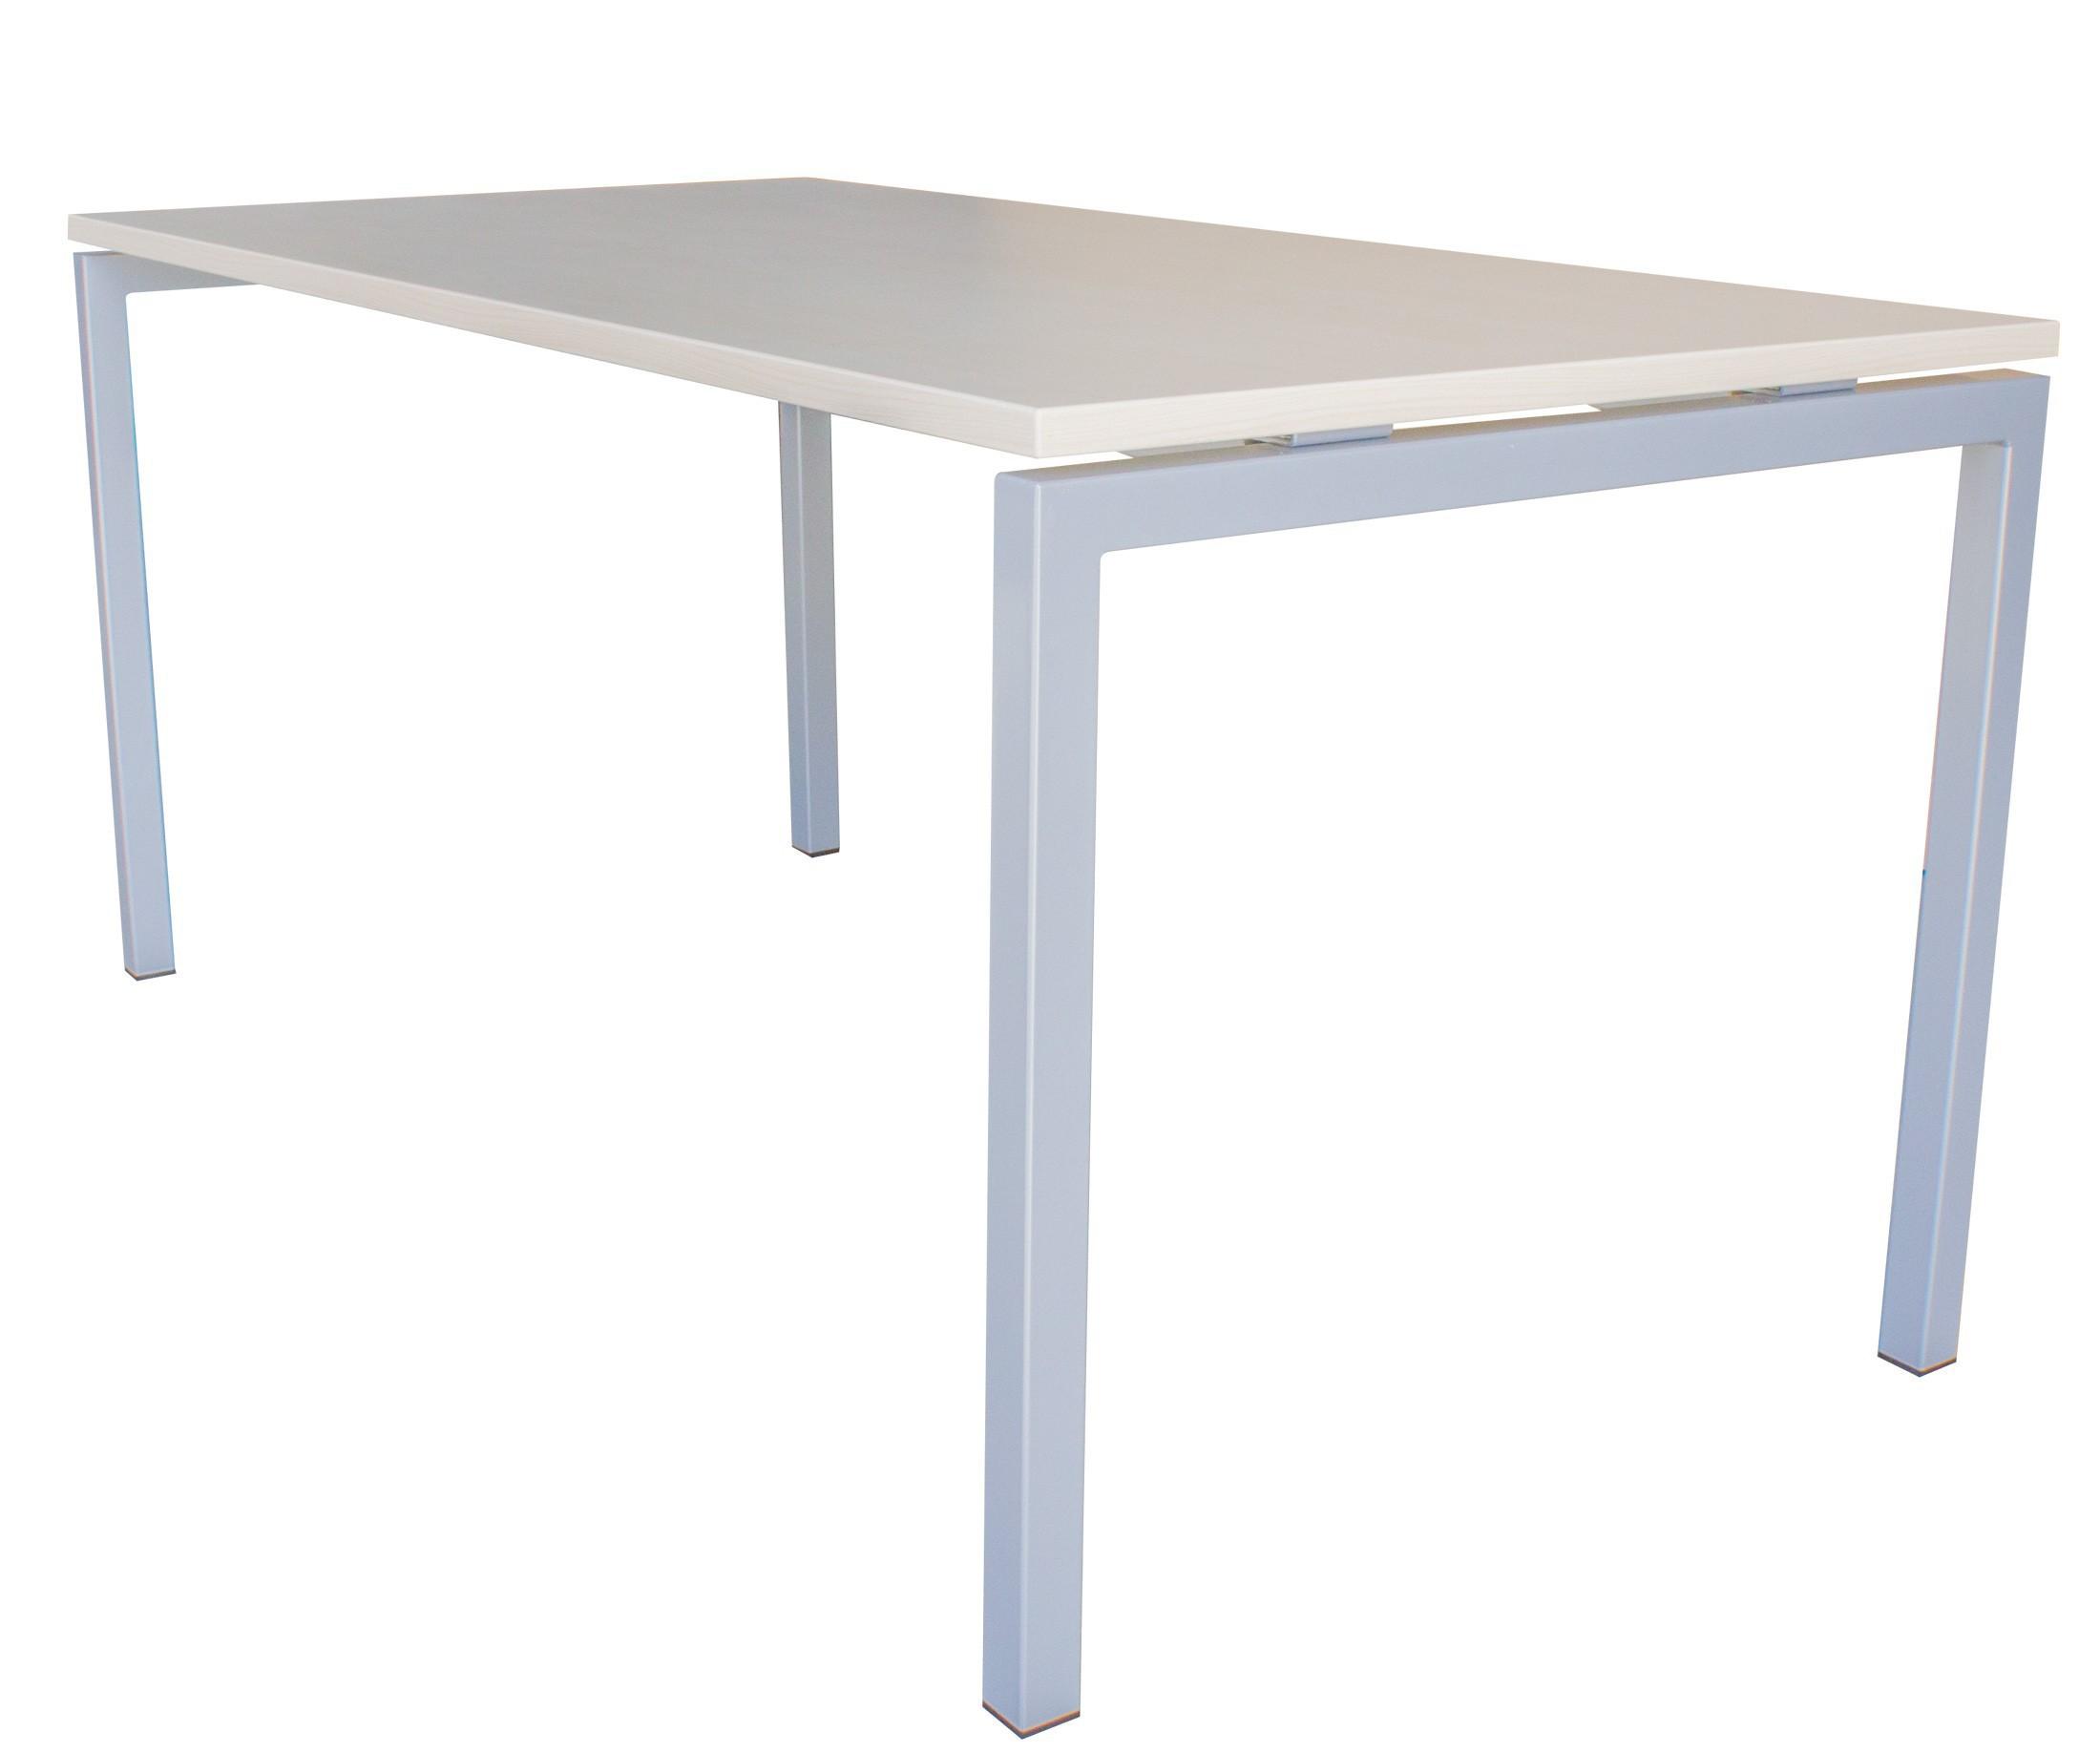 Komplettbüro NOVA Landshut Ahorn/Weiß Büromöbel-Set Einzelarbeitsplätze